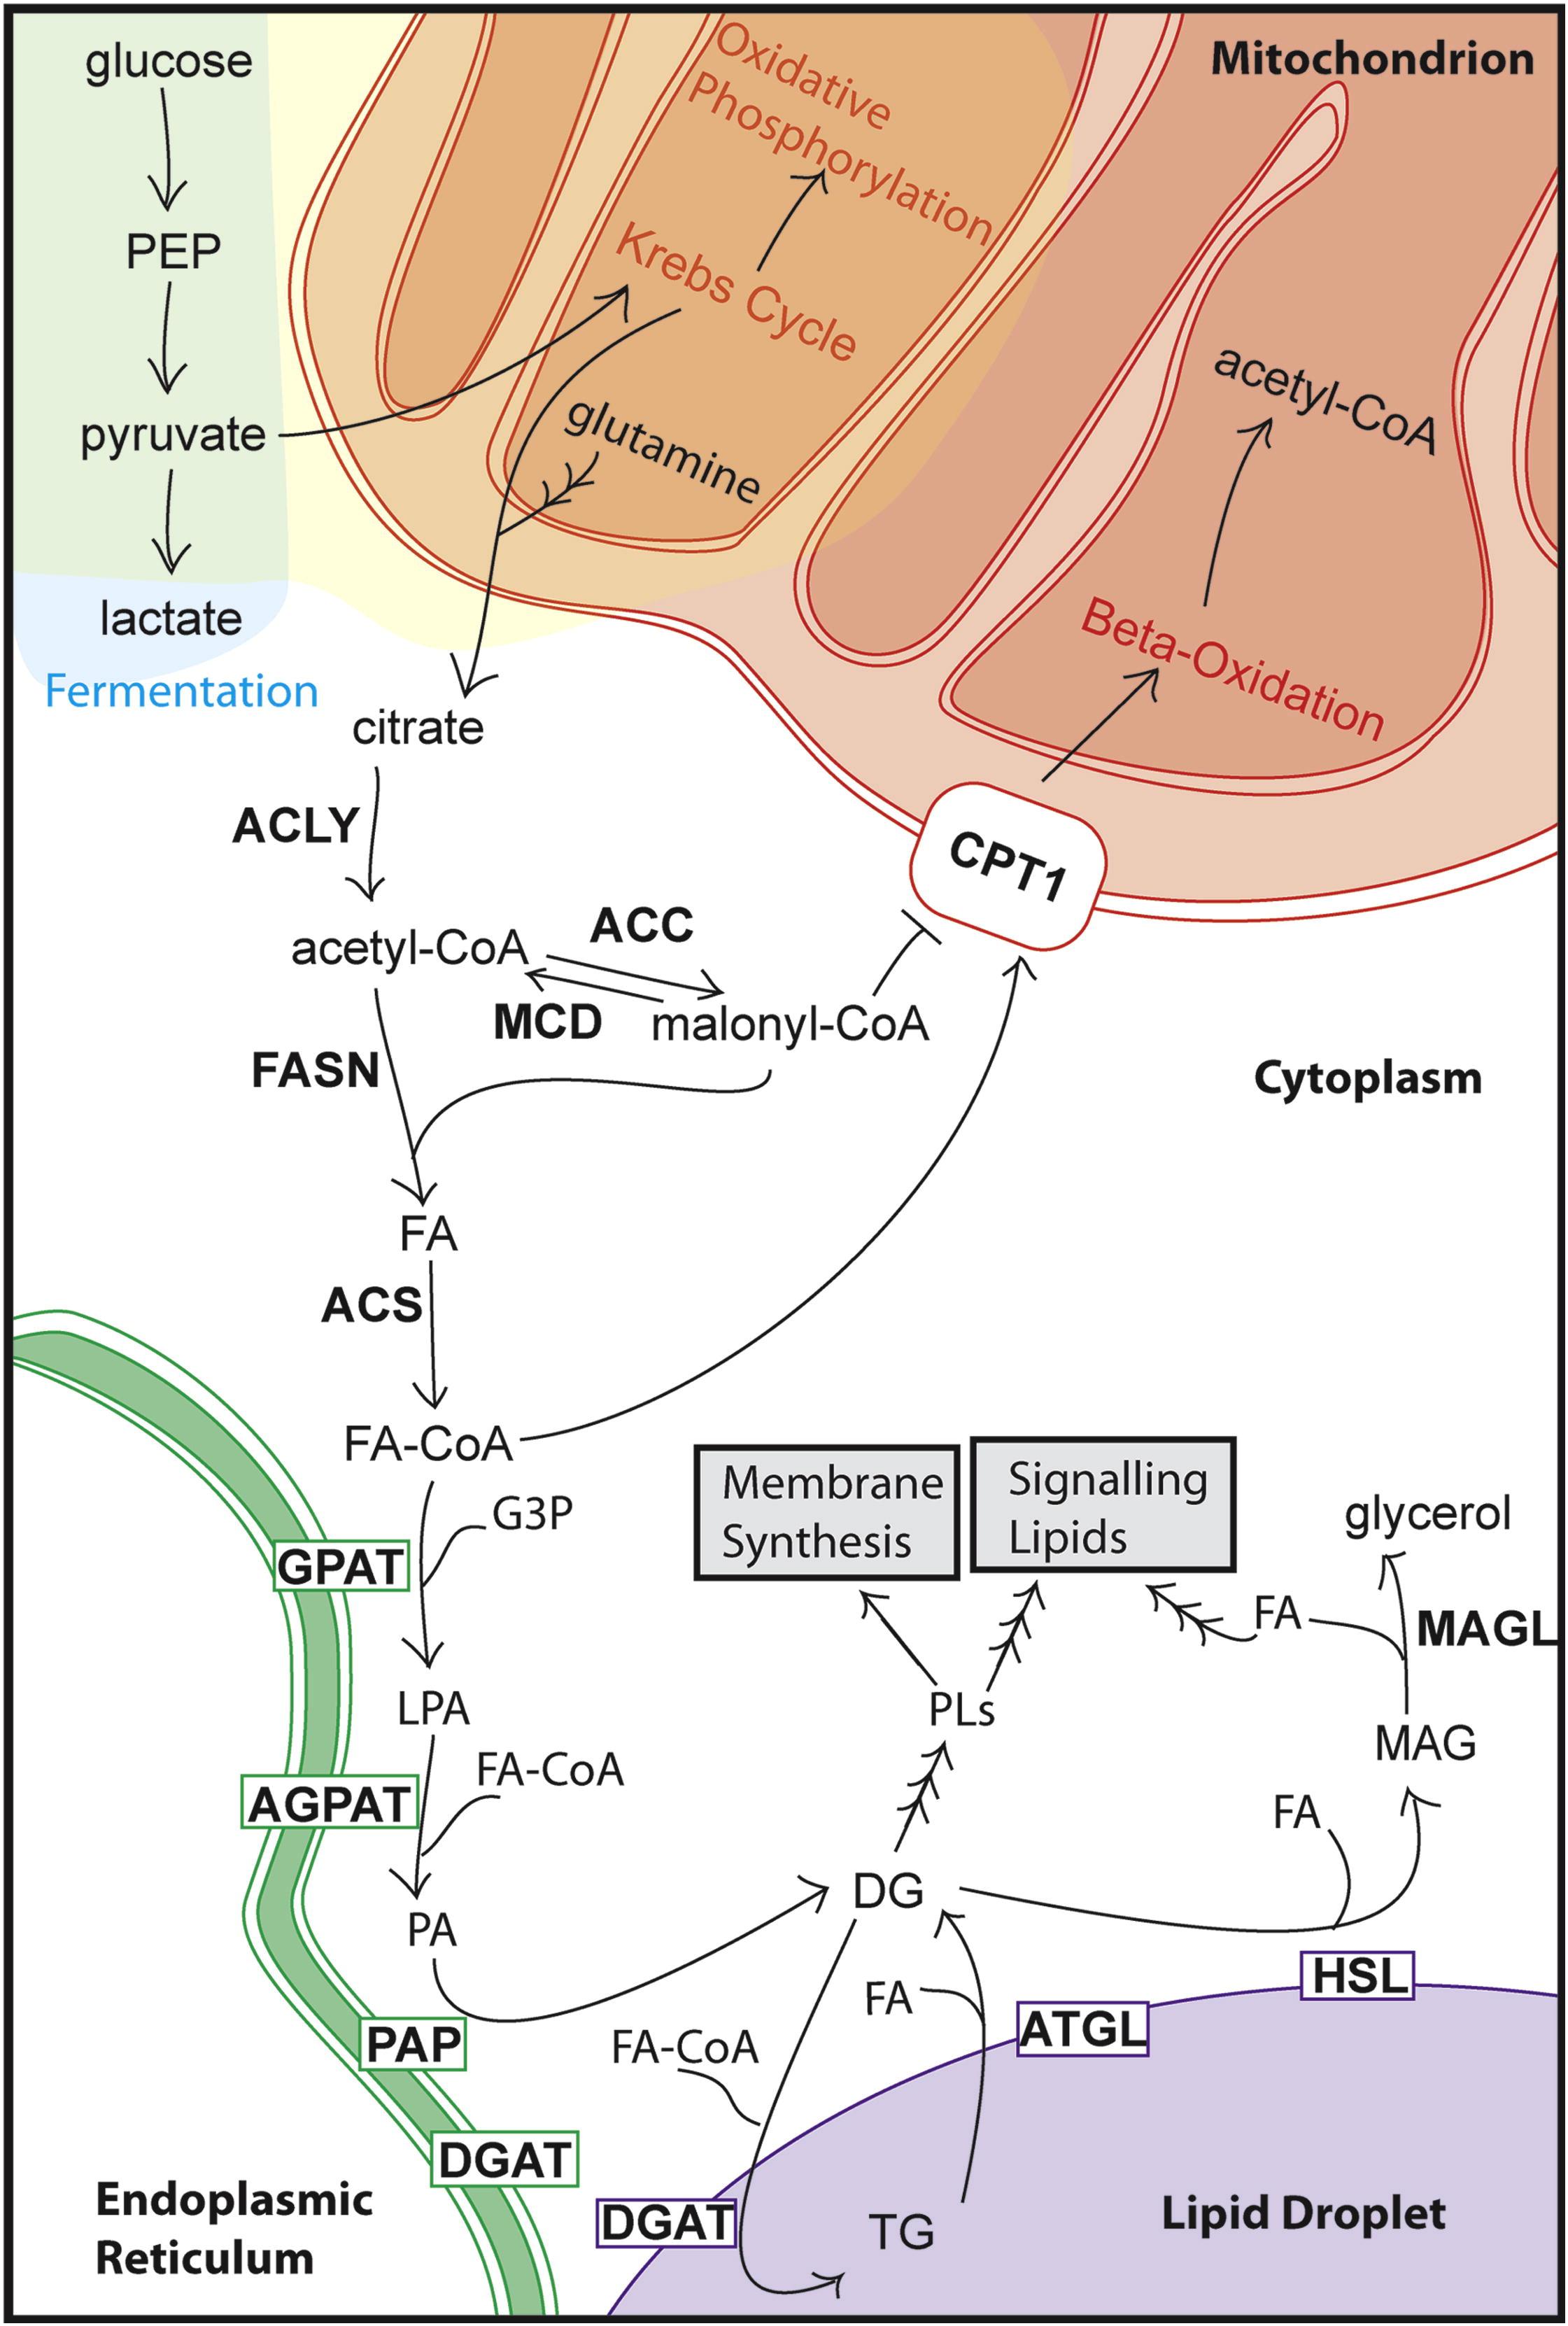 Cellular Fatty Acid Metabolism And Cancer Cell Metabolism